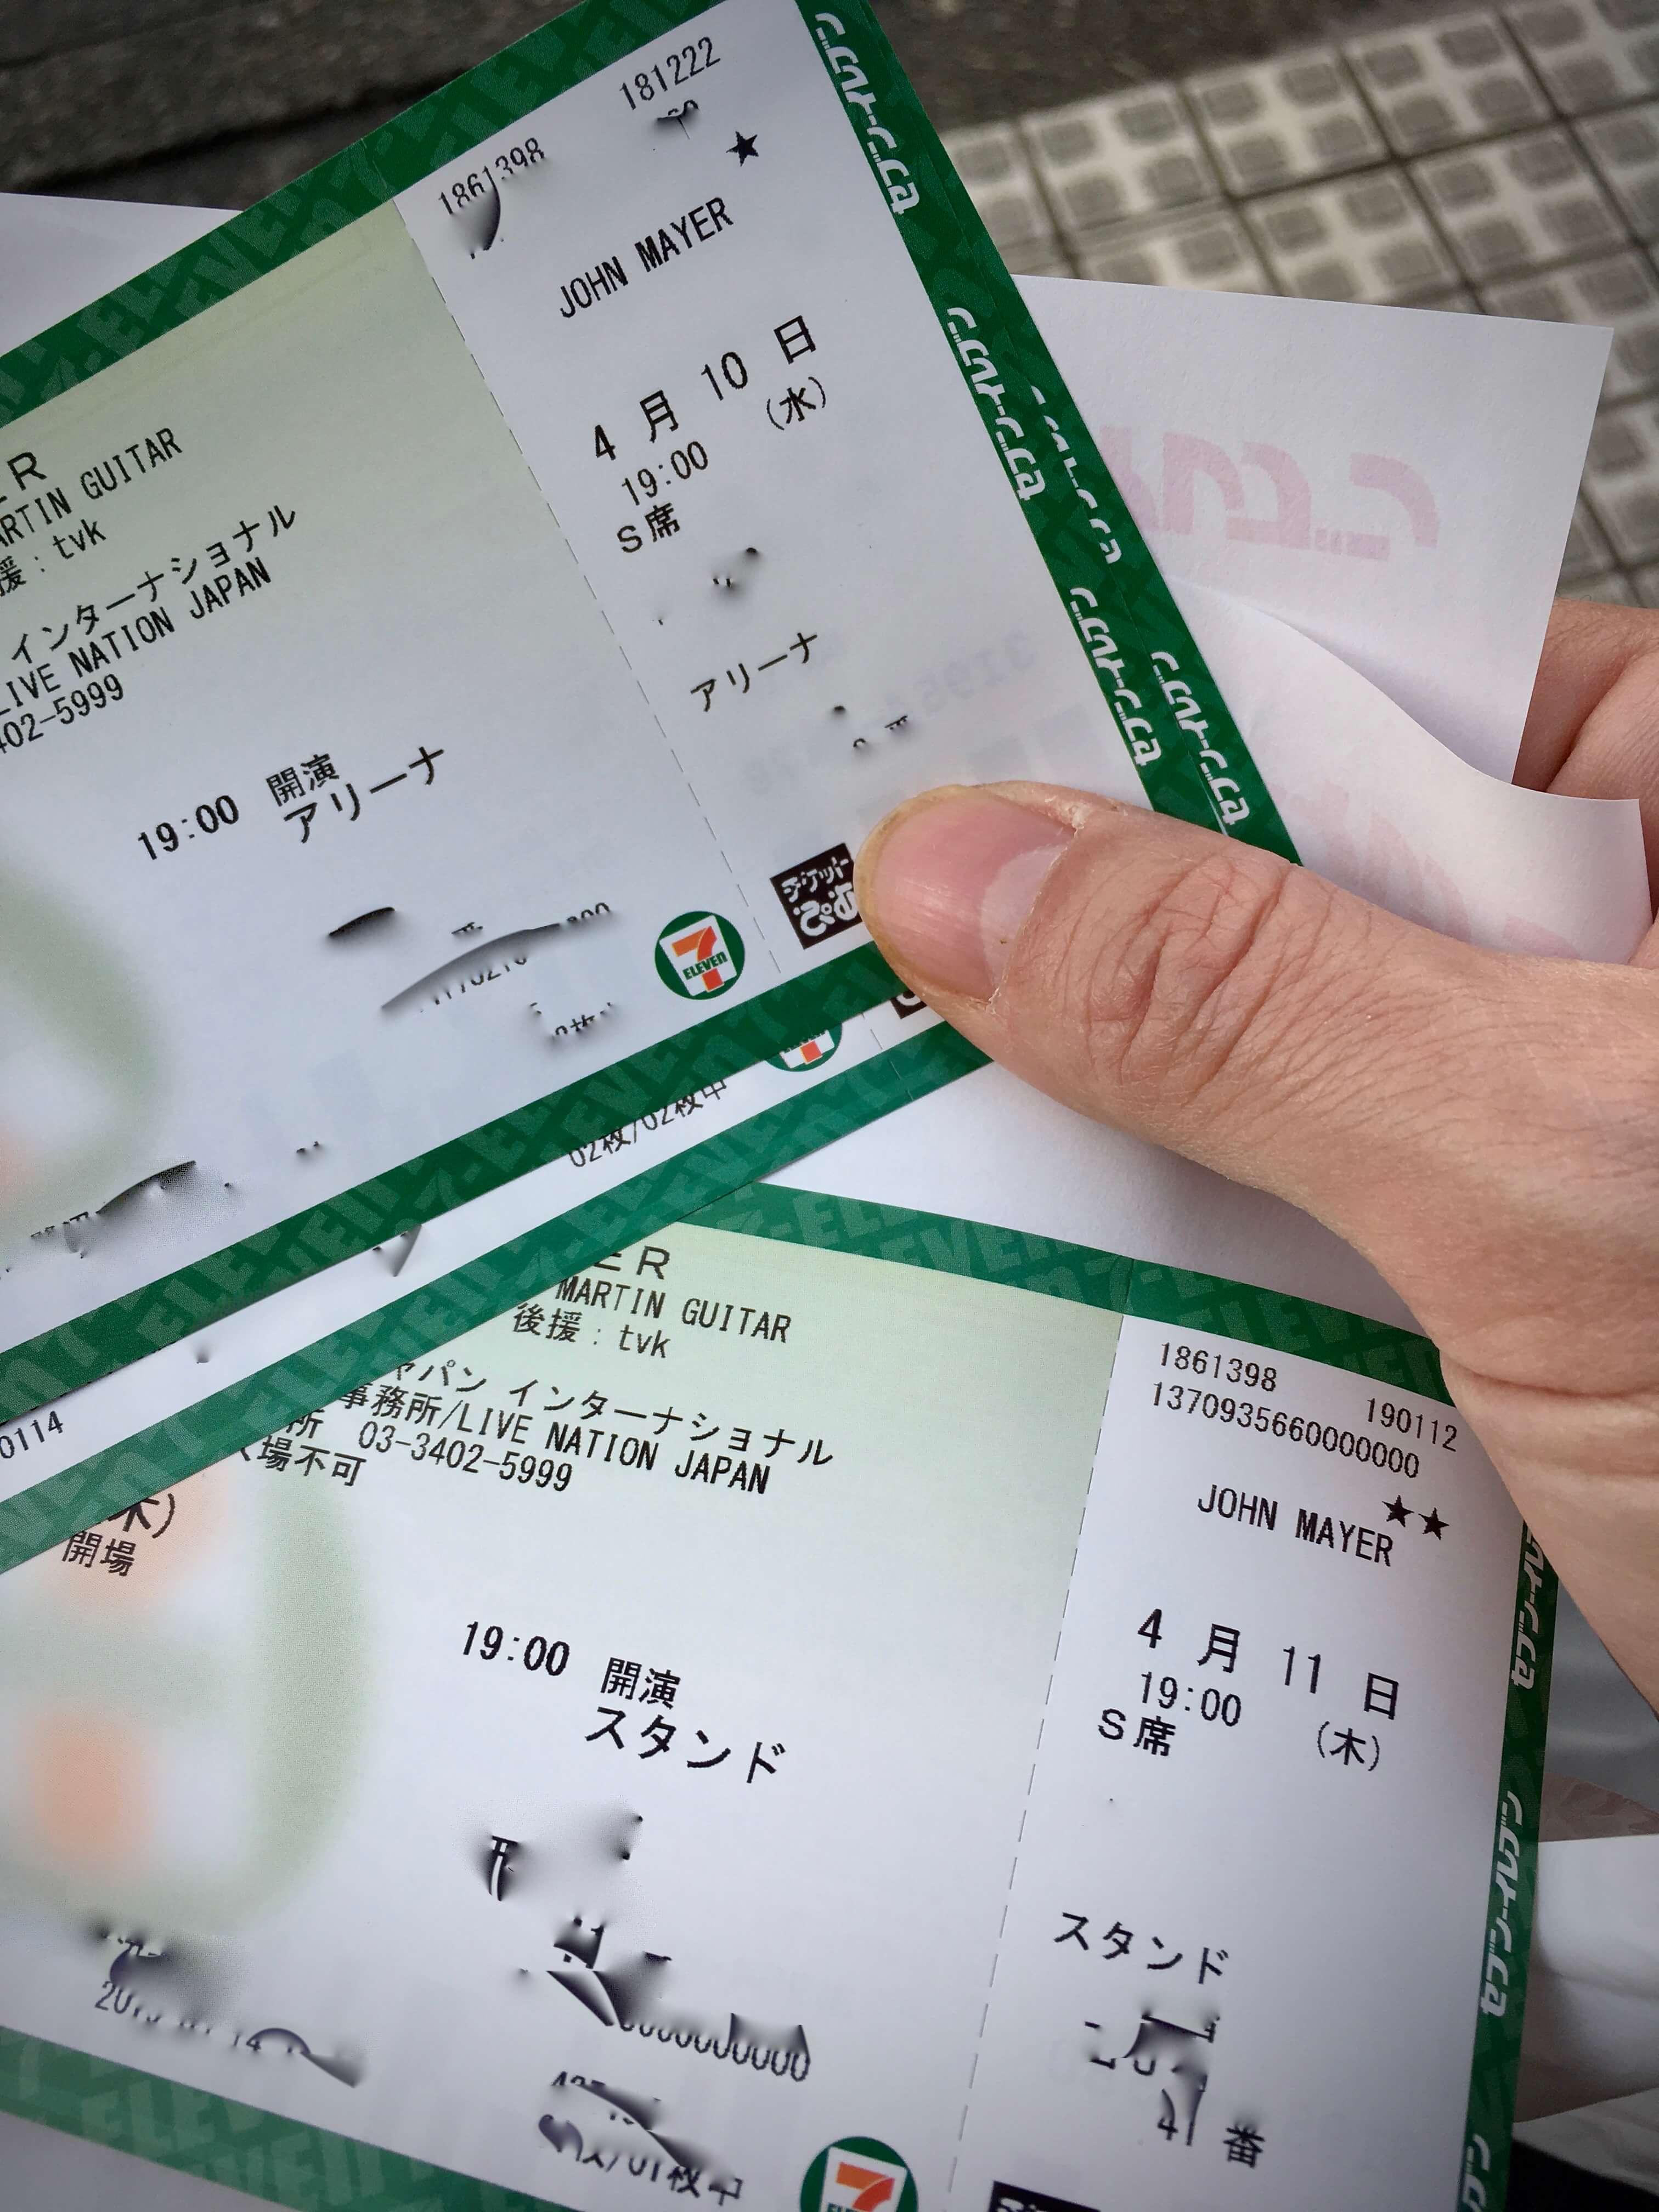 Joh Mayer 武道館ライブチケット引き換えして来ました